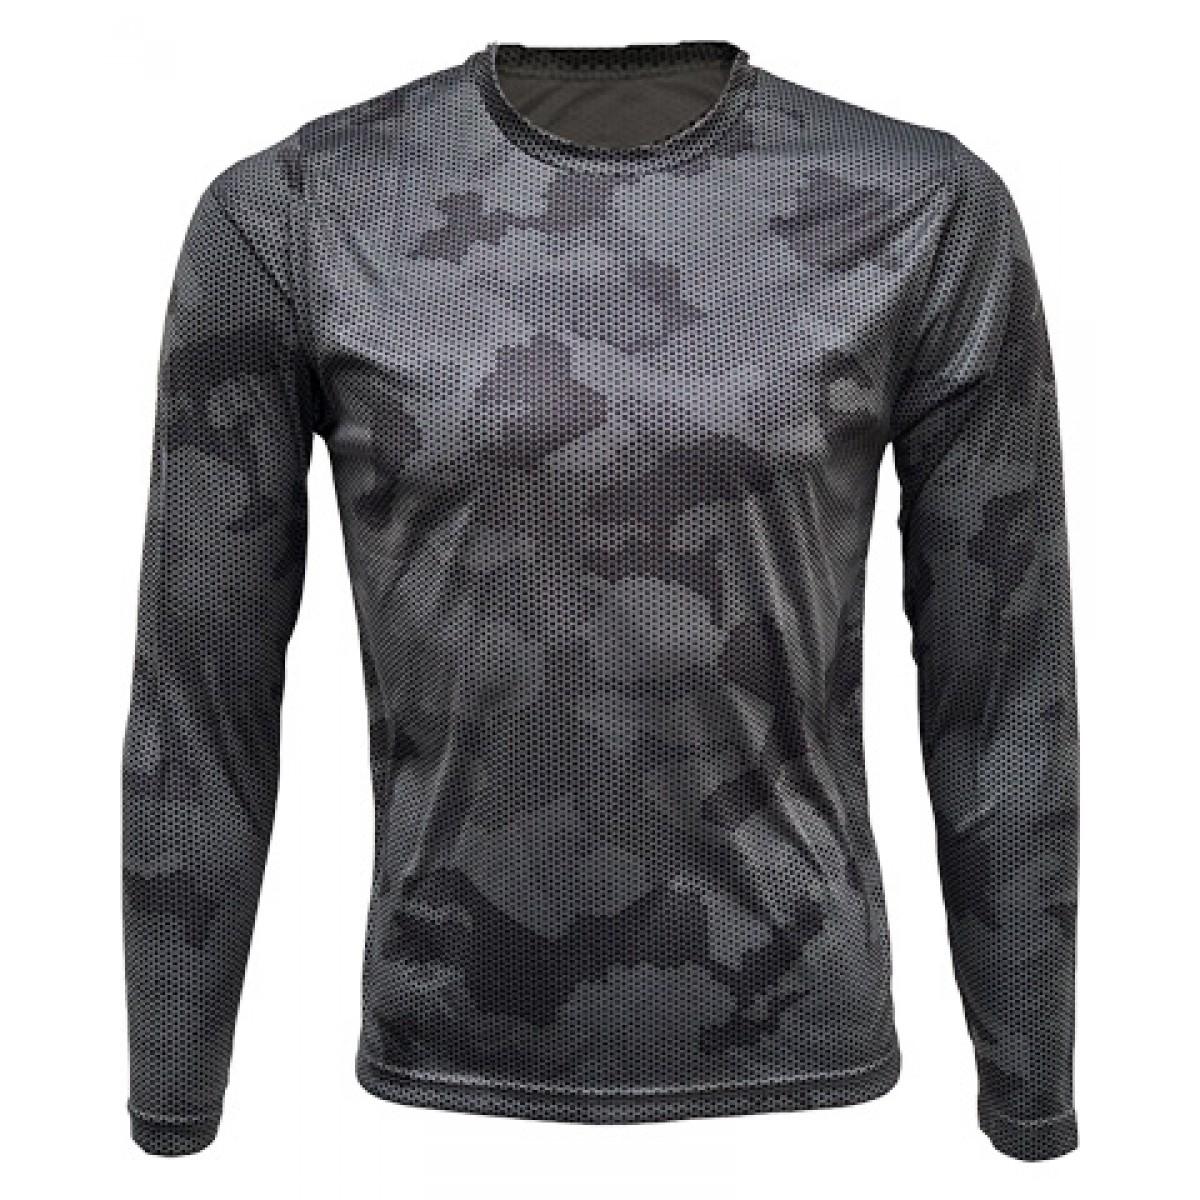 Gray/Black Camo Long Sleeve